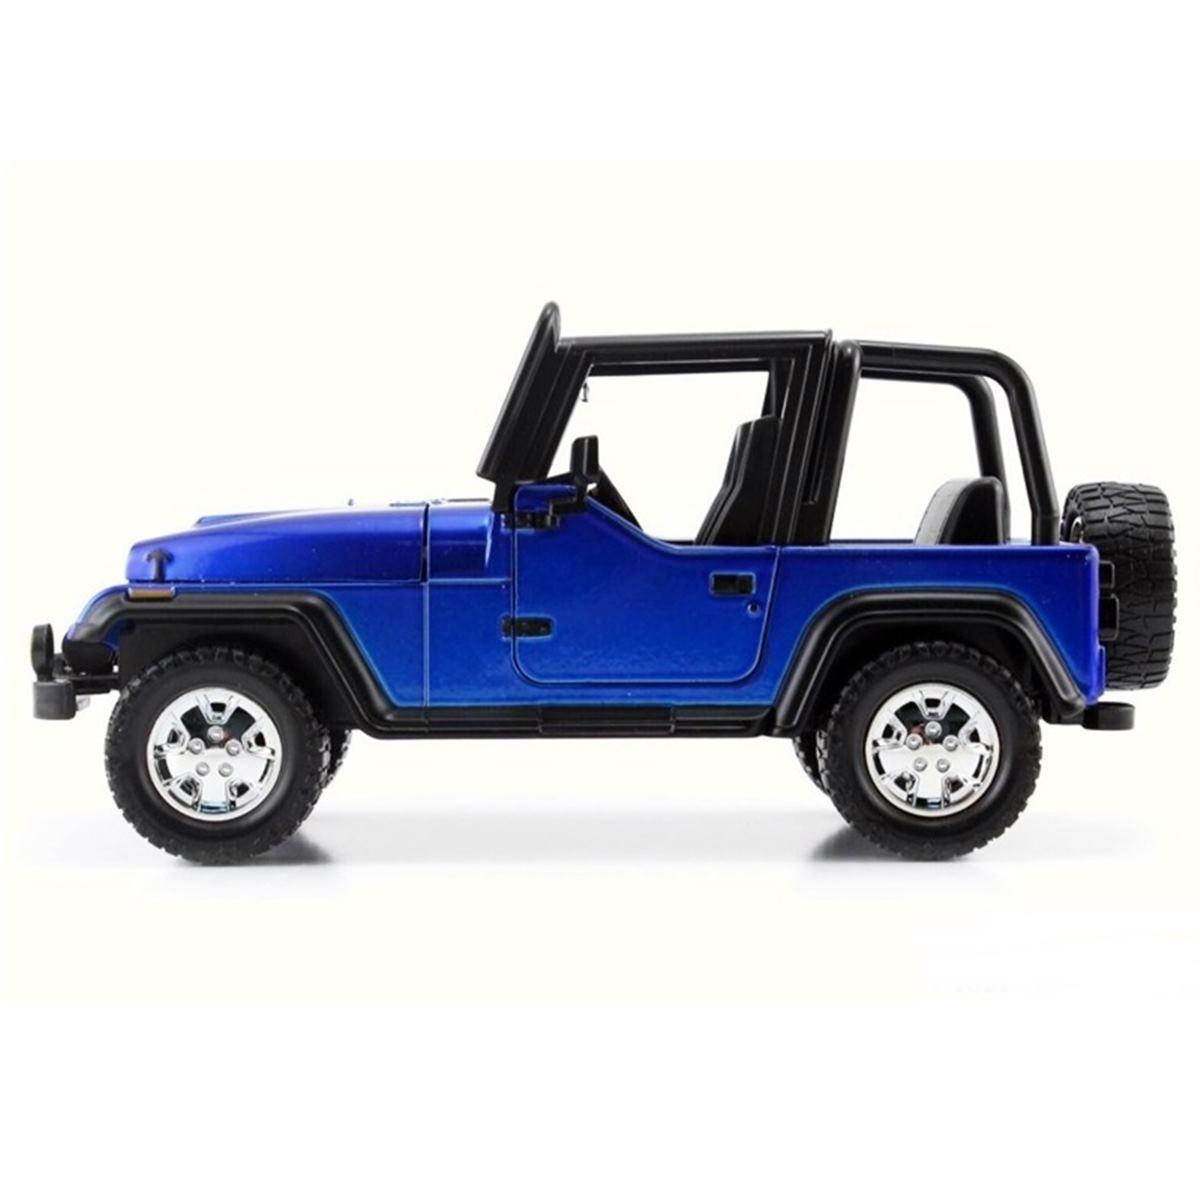 Miniatura Jeep Wrangler 1992 Azul 1/24 Jada Toys